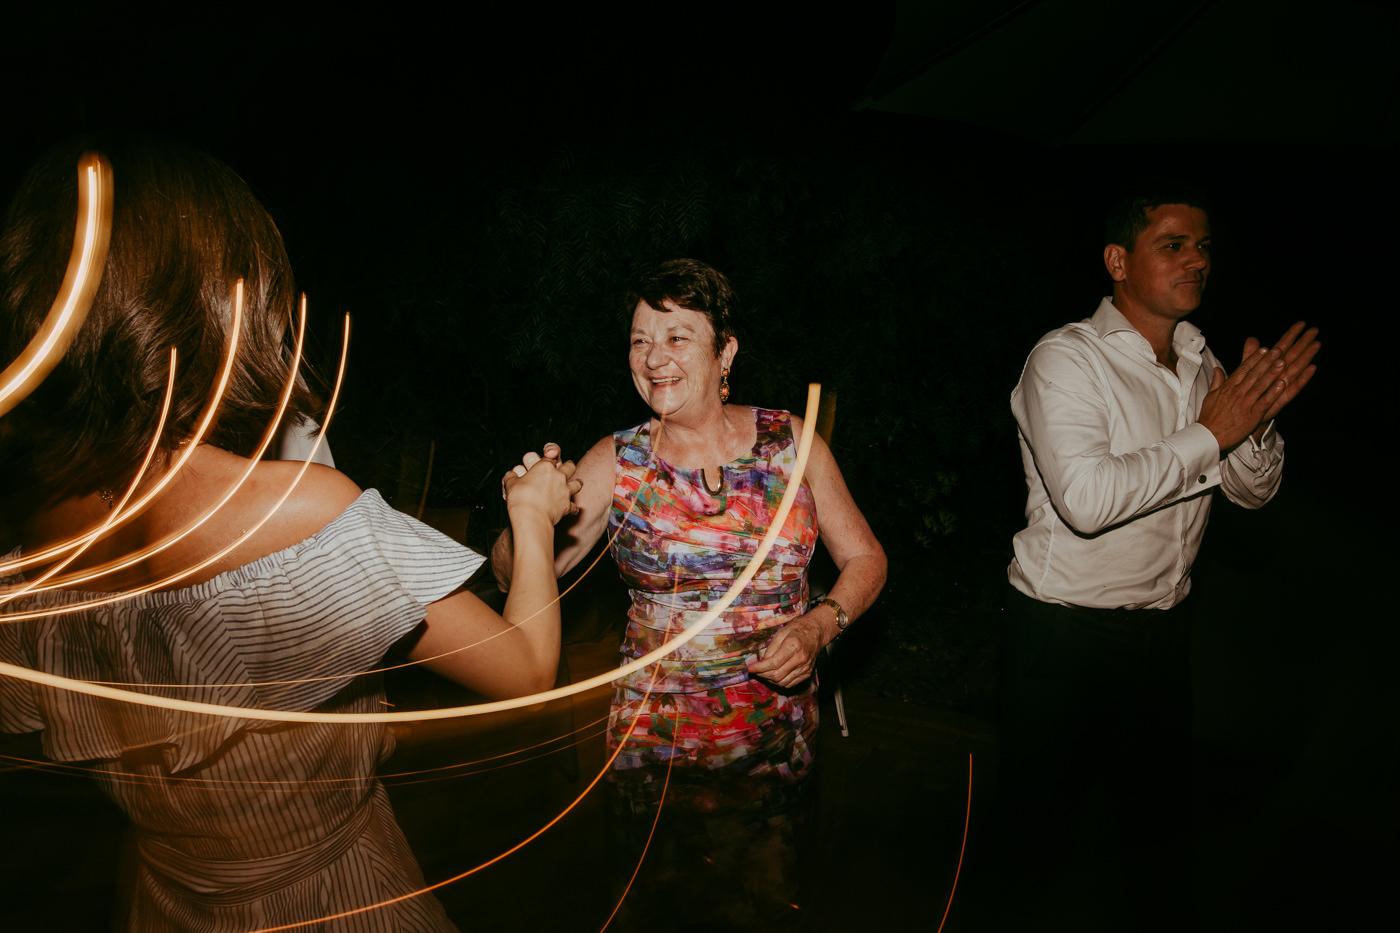 Anthony & Eliet - Wagga Wagga Wedding - Country NSW - Samantha Heather Photography-185.jpg